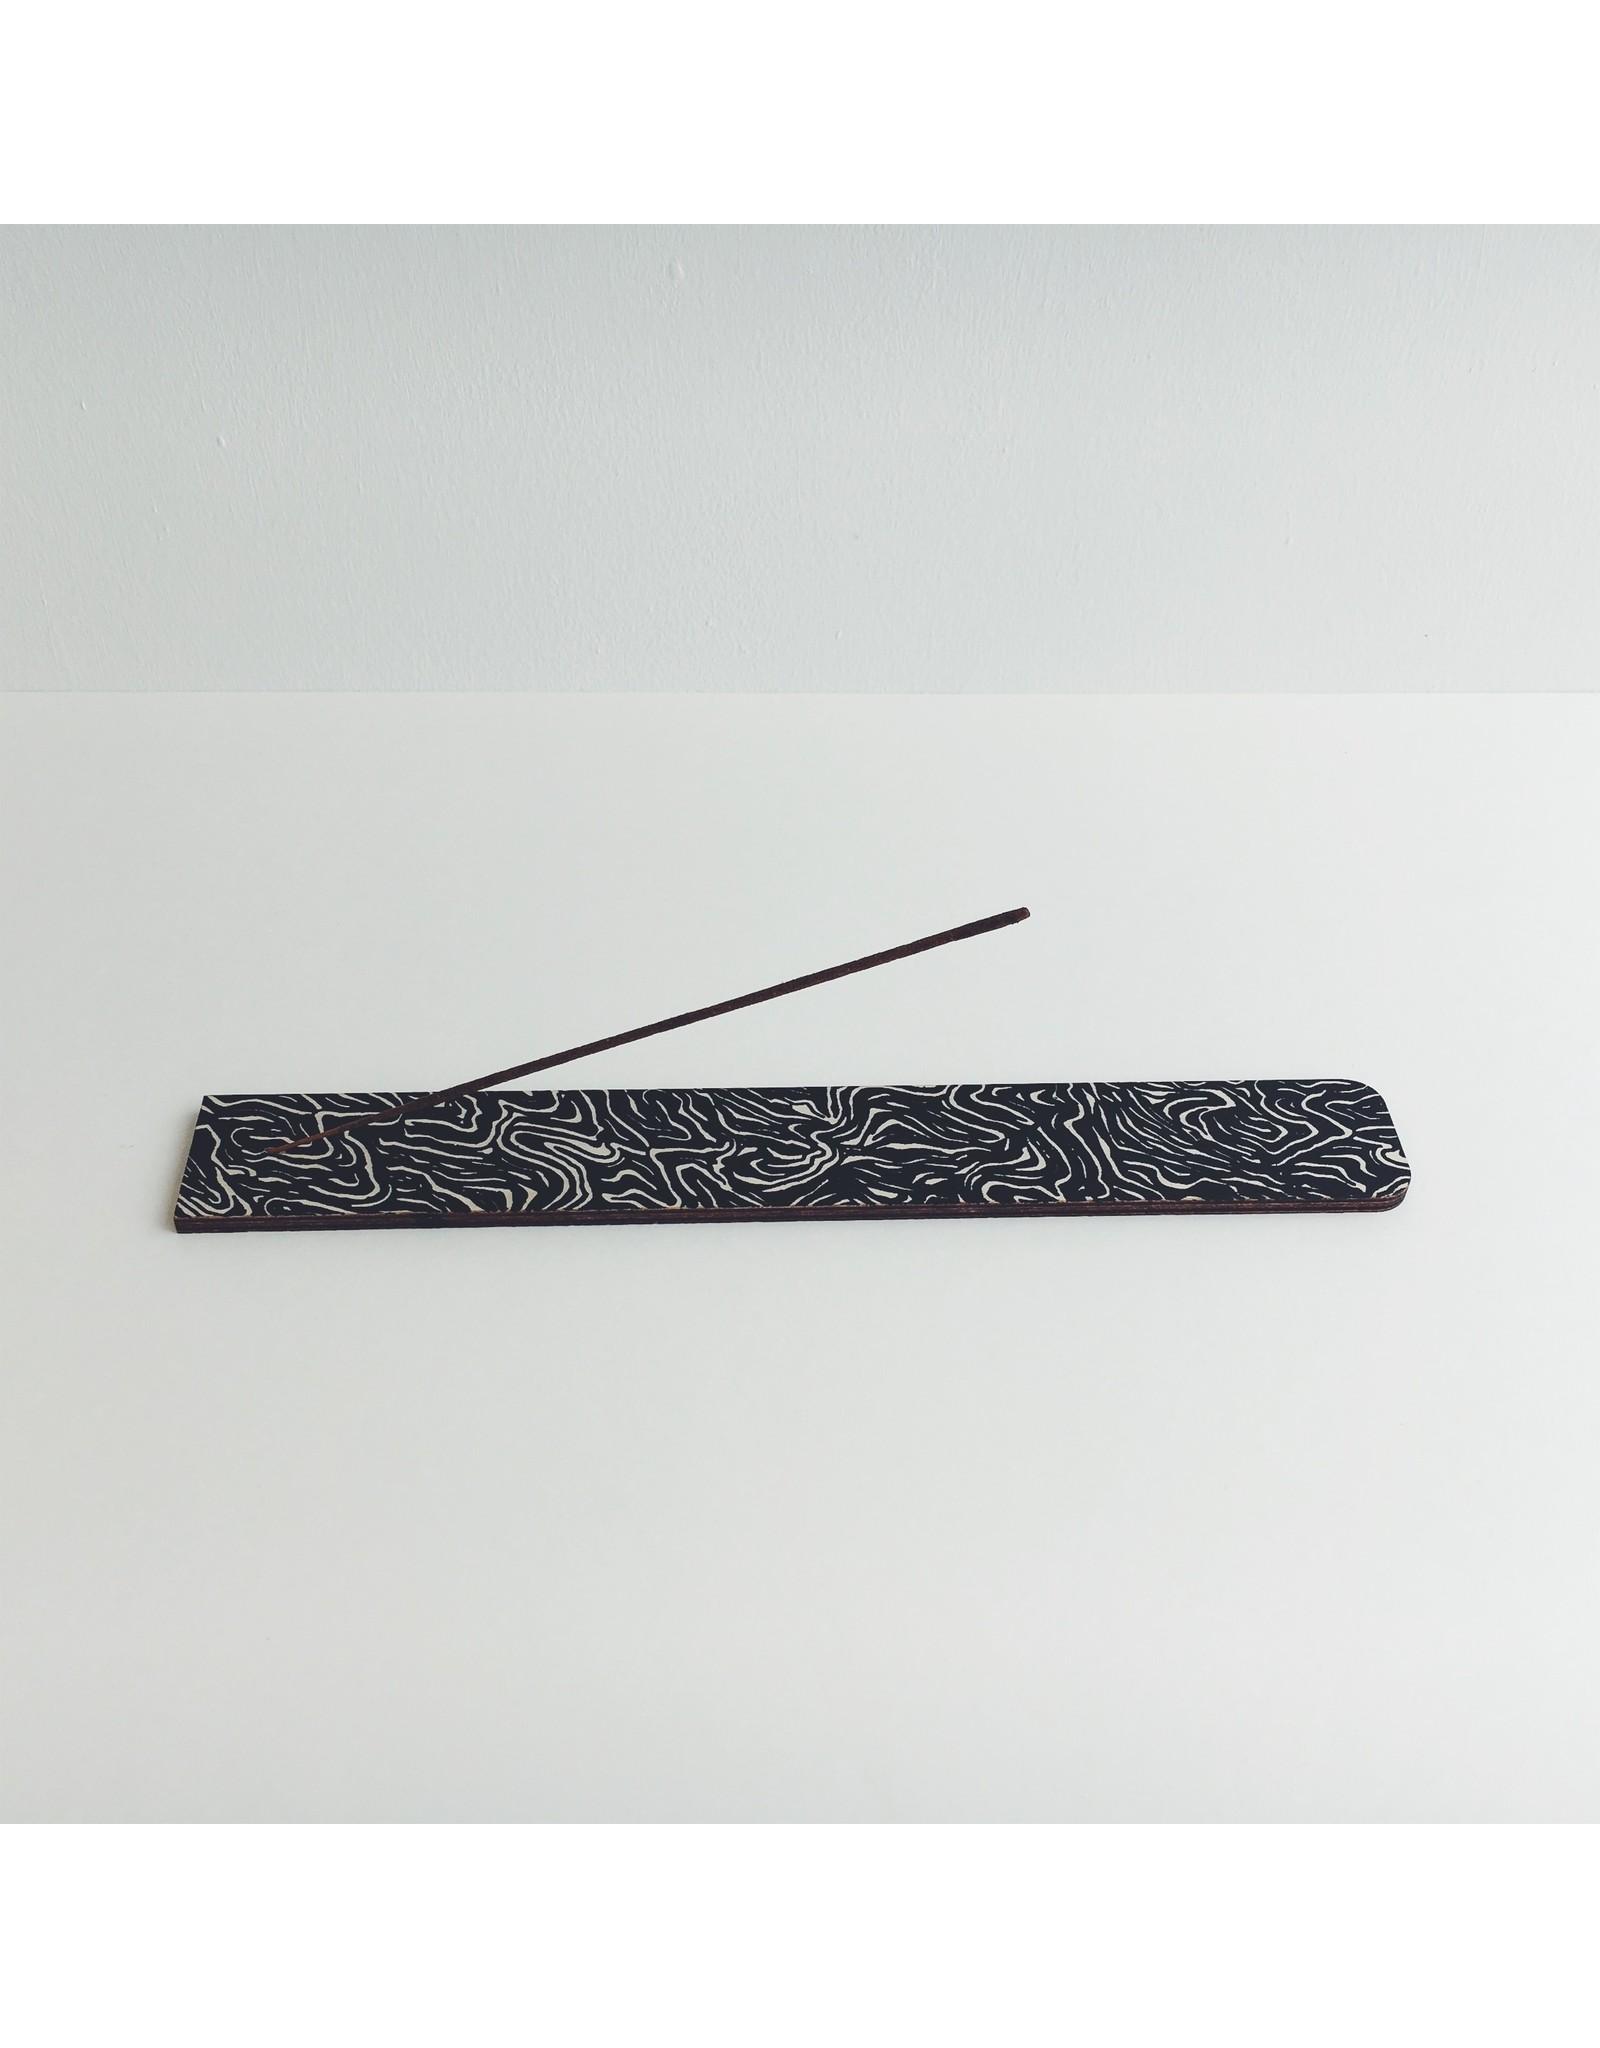 Monochrome Incense Holder